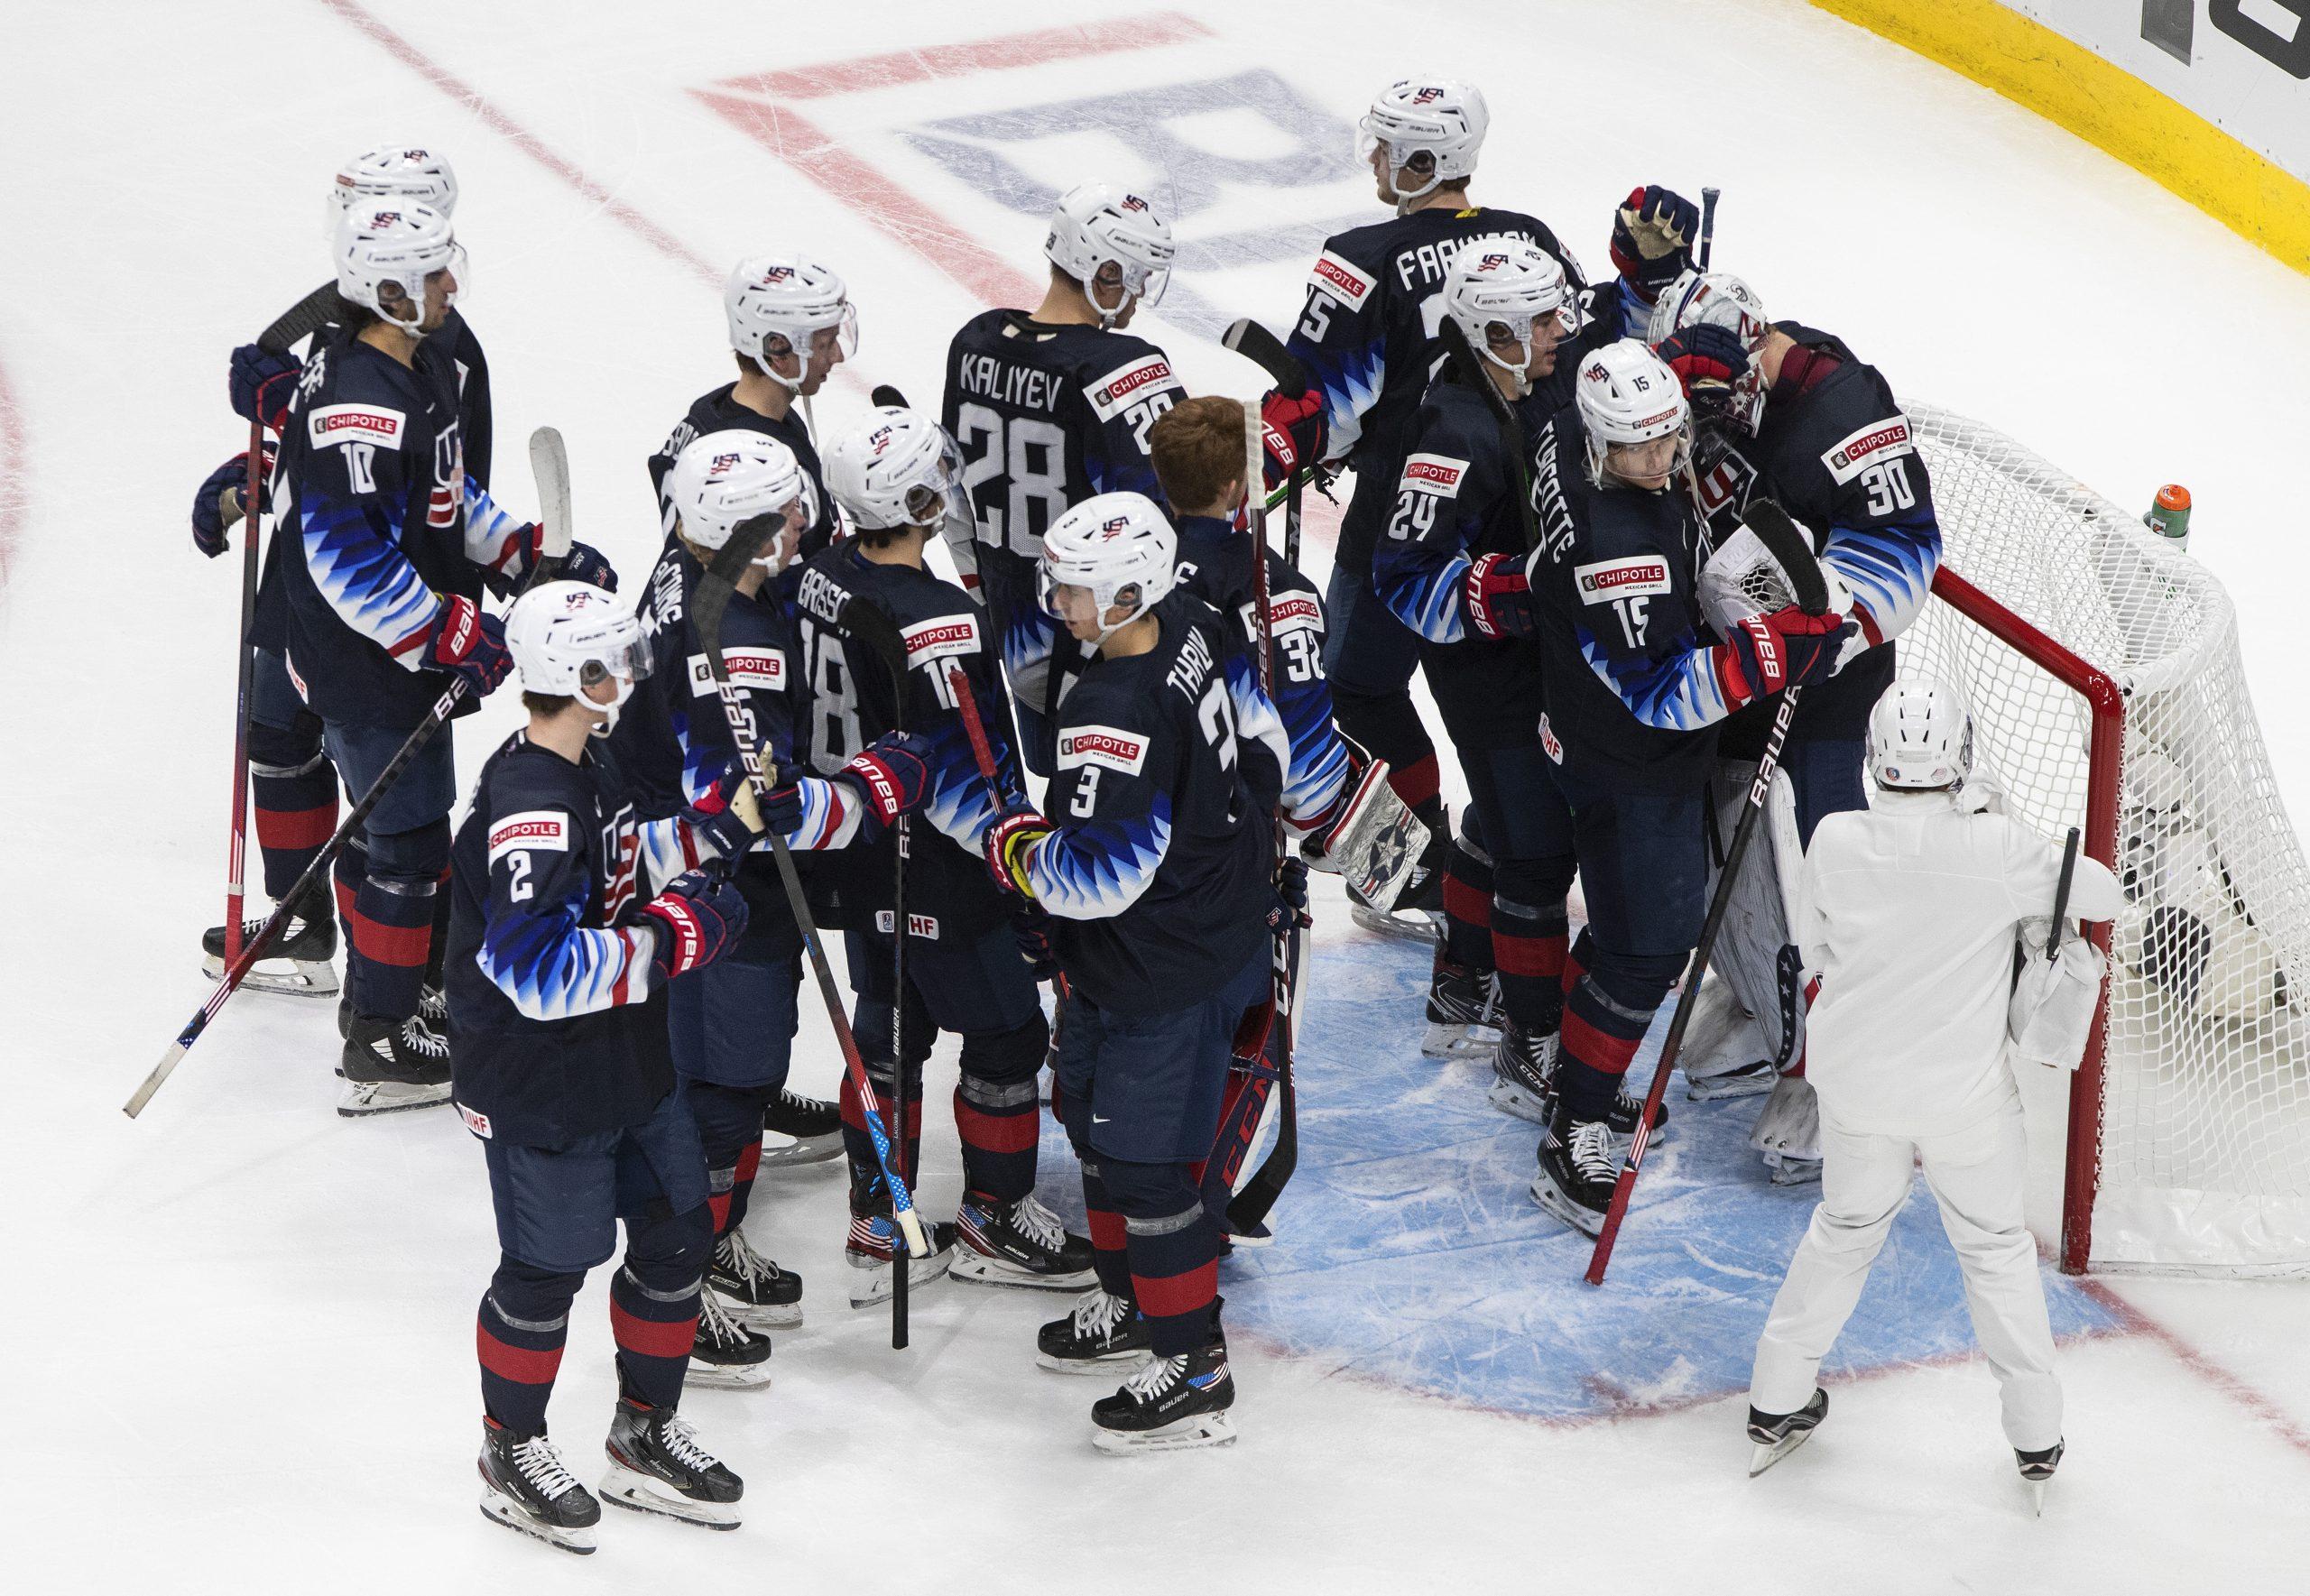 Canada Falls In World Junior Final